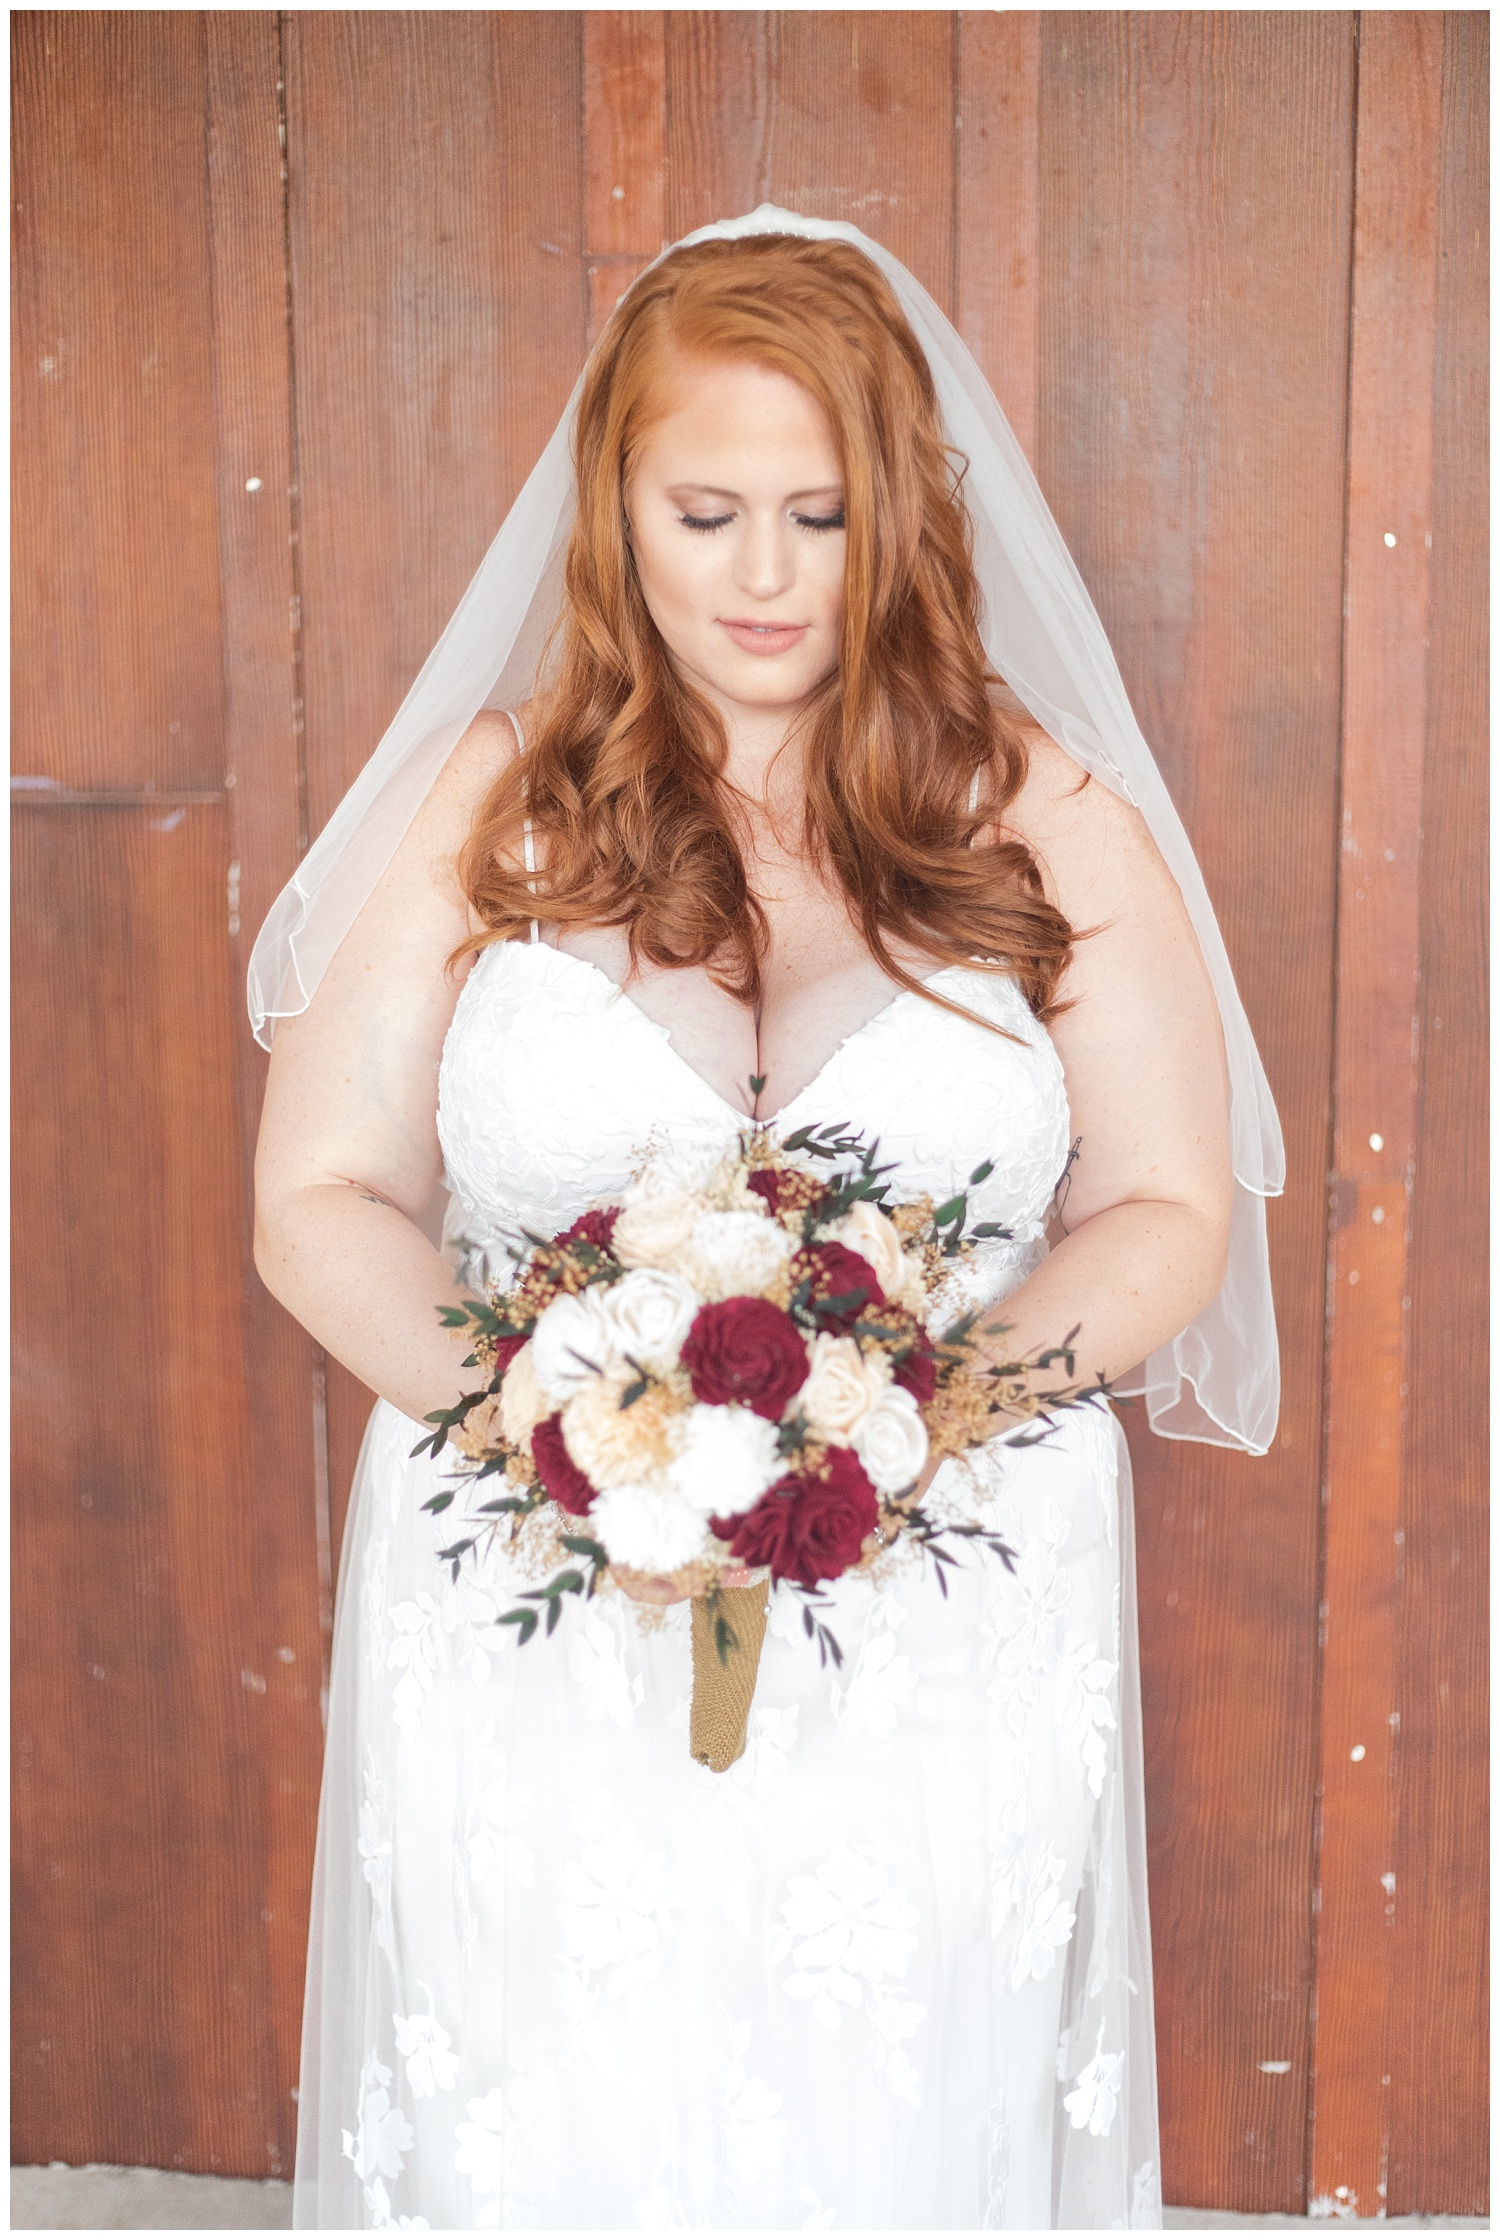 MJMP Richmond Wedding Photographer Linganore Winecellars Wedding Photo_0032.jpg